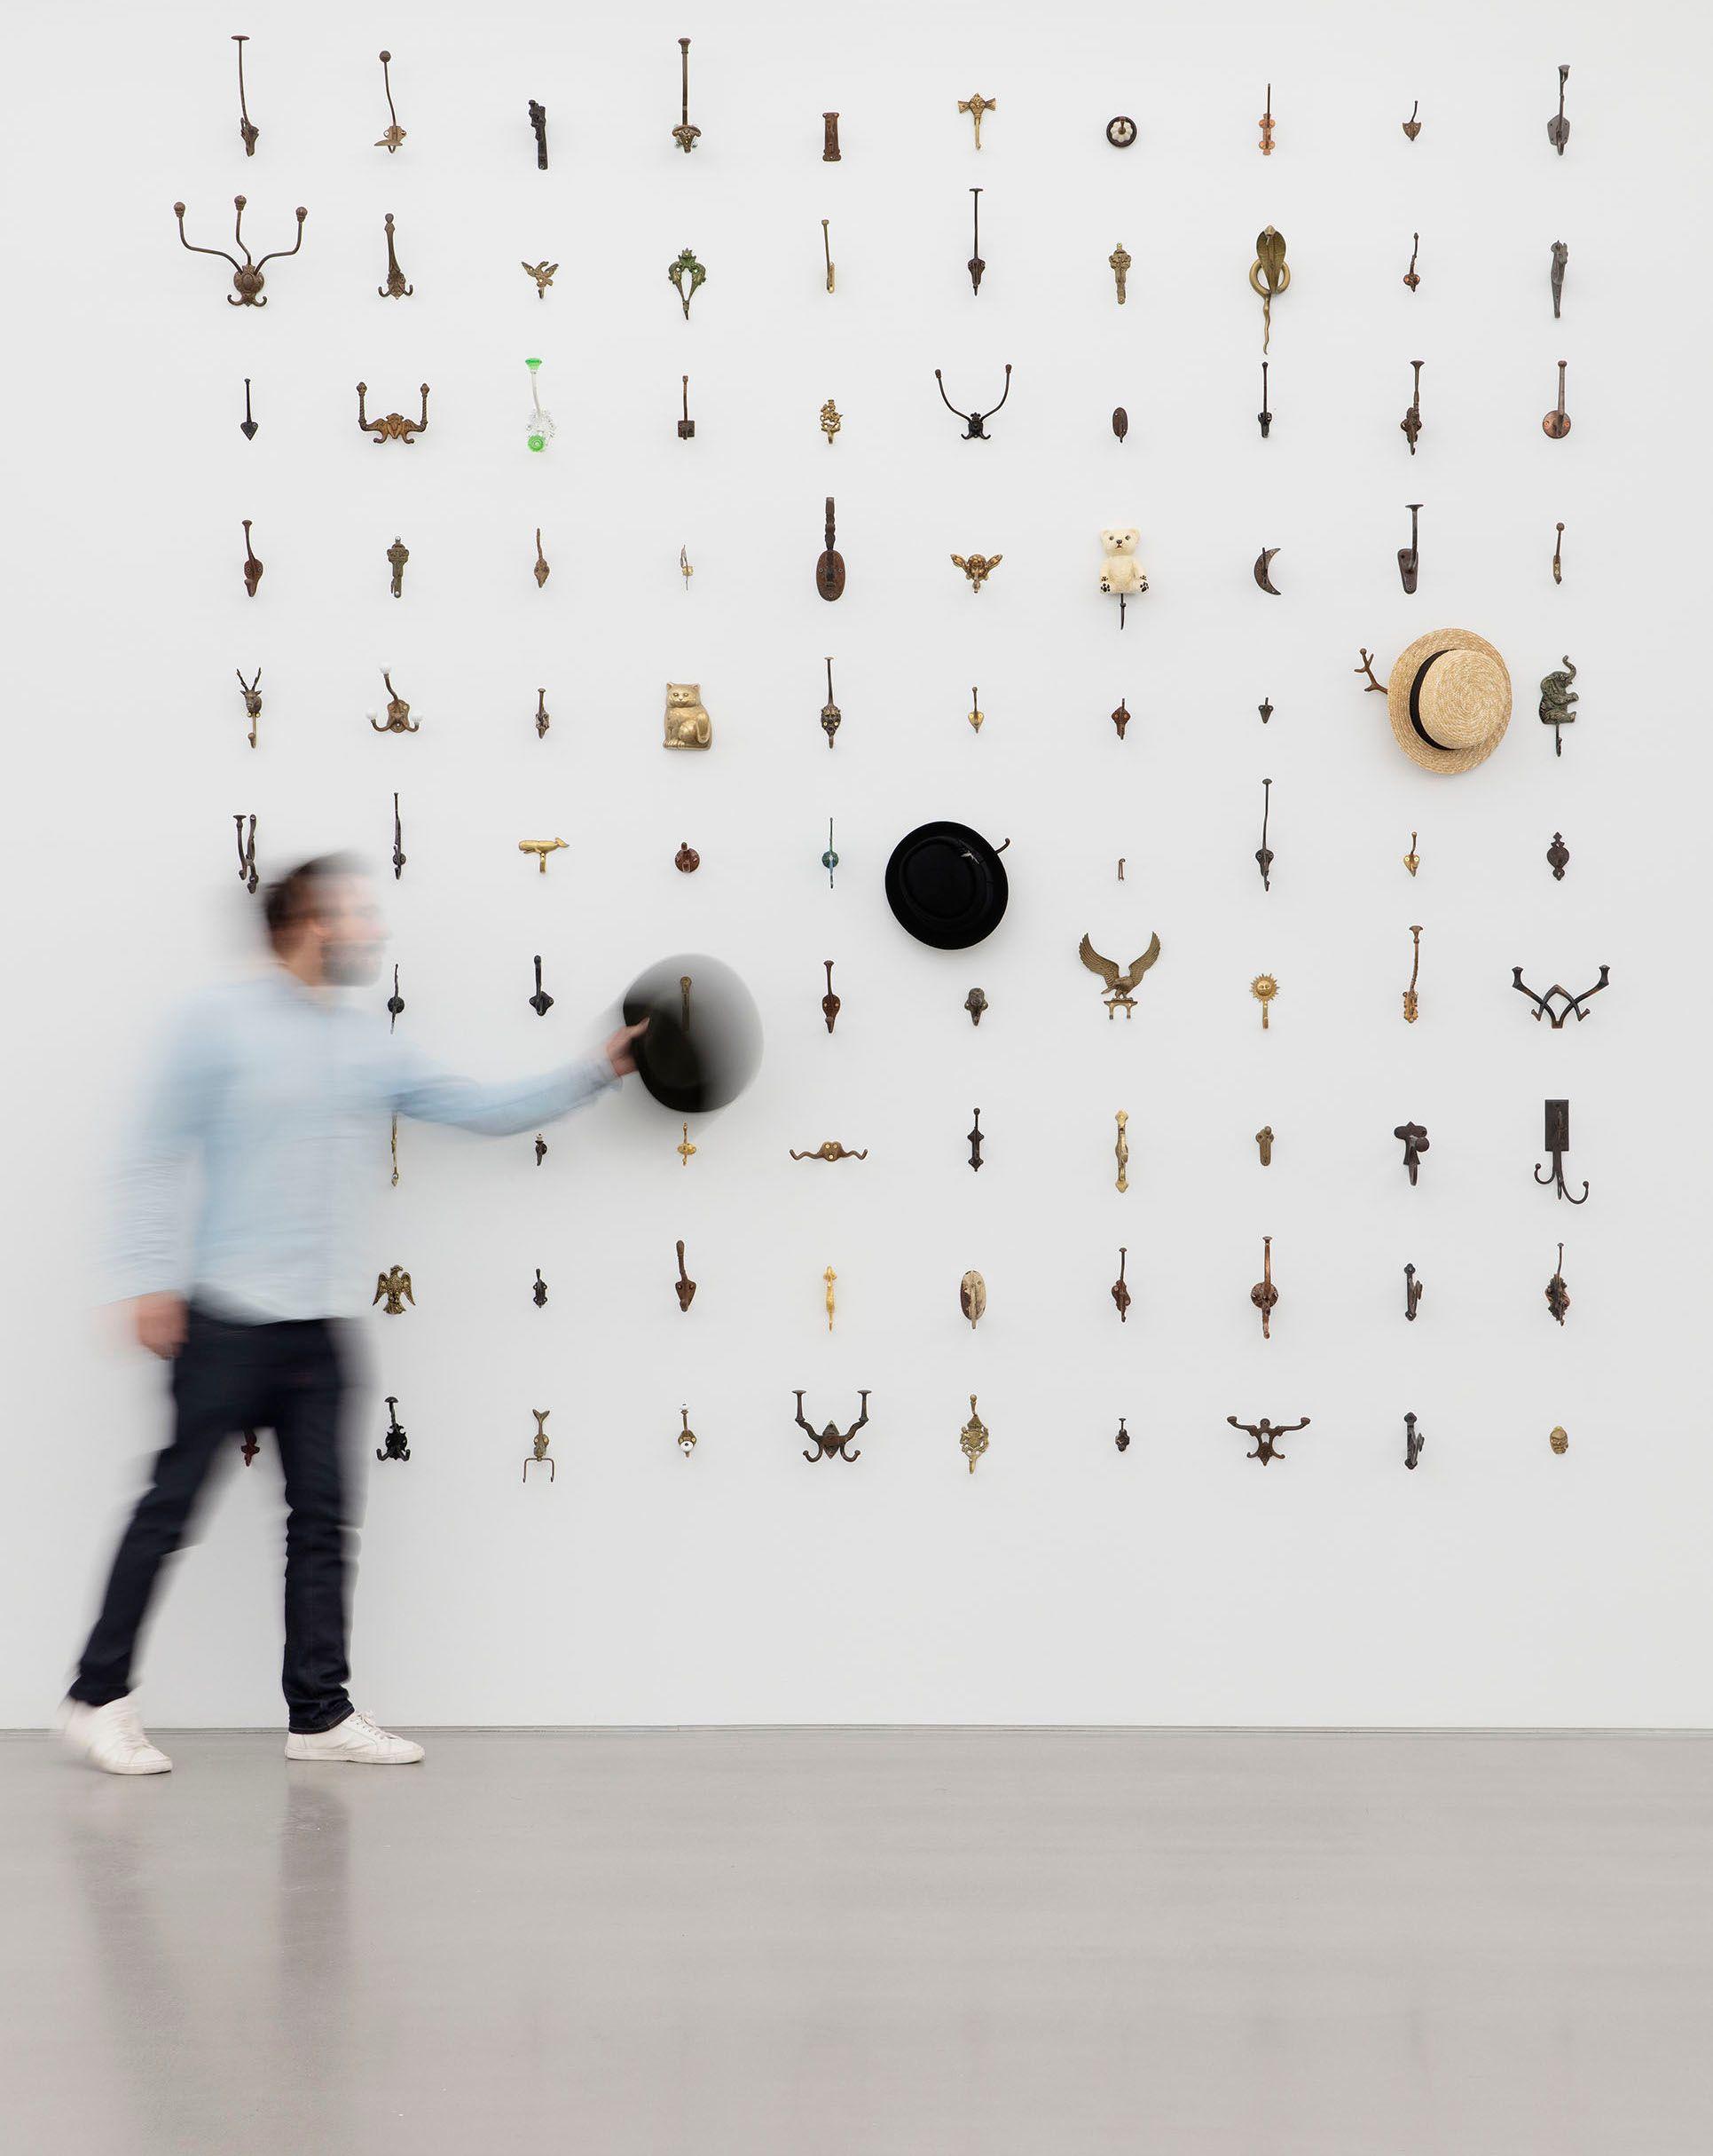 Artist:ERICSON & ZIEGLER, Exhibition:Activated Artifacts